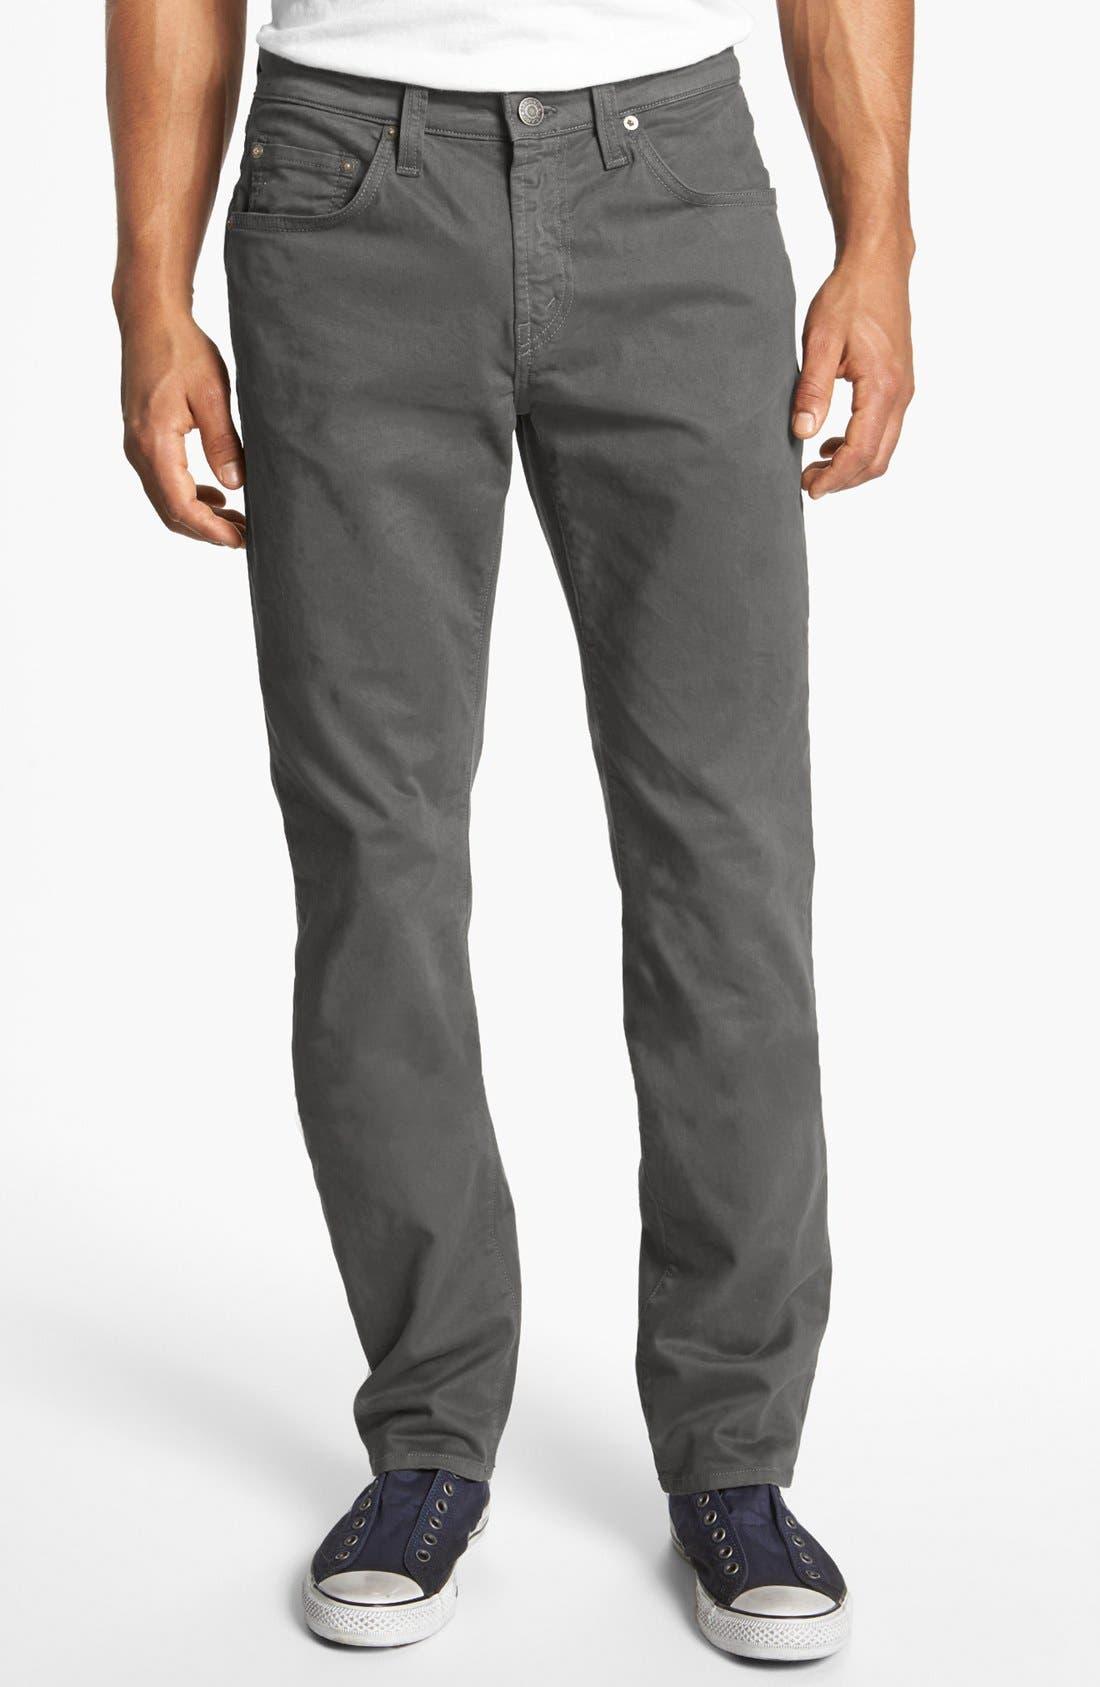 J BRAND Kane Slim Fit Cotton Twill Pants